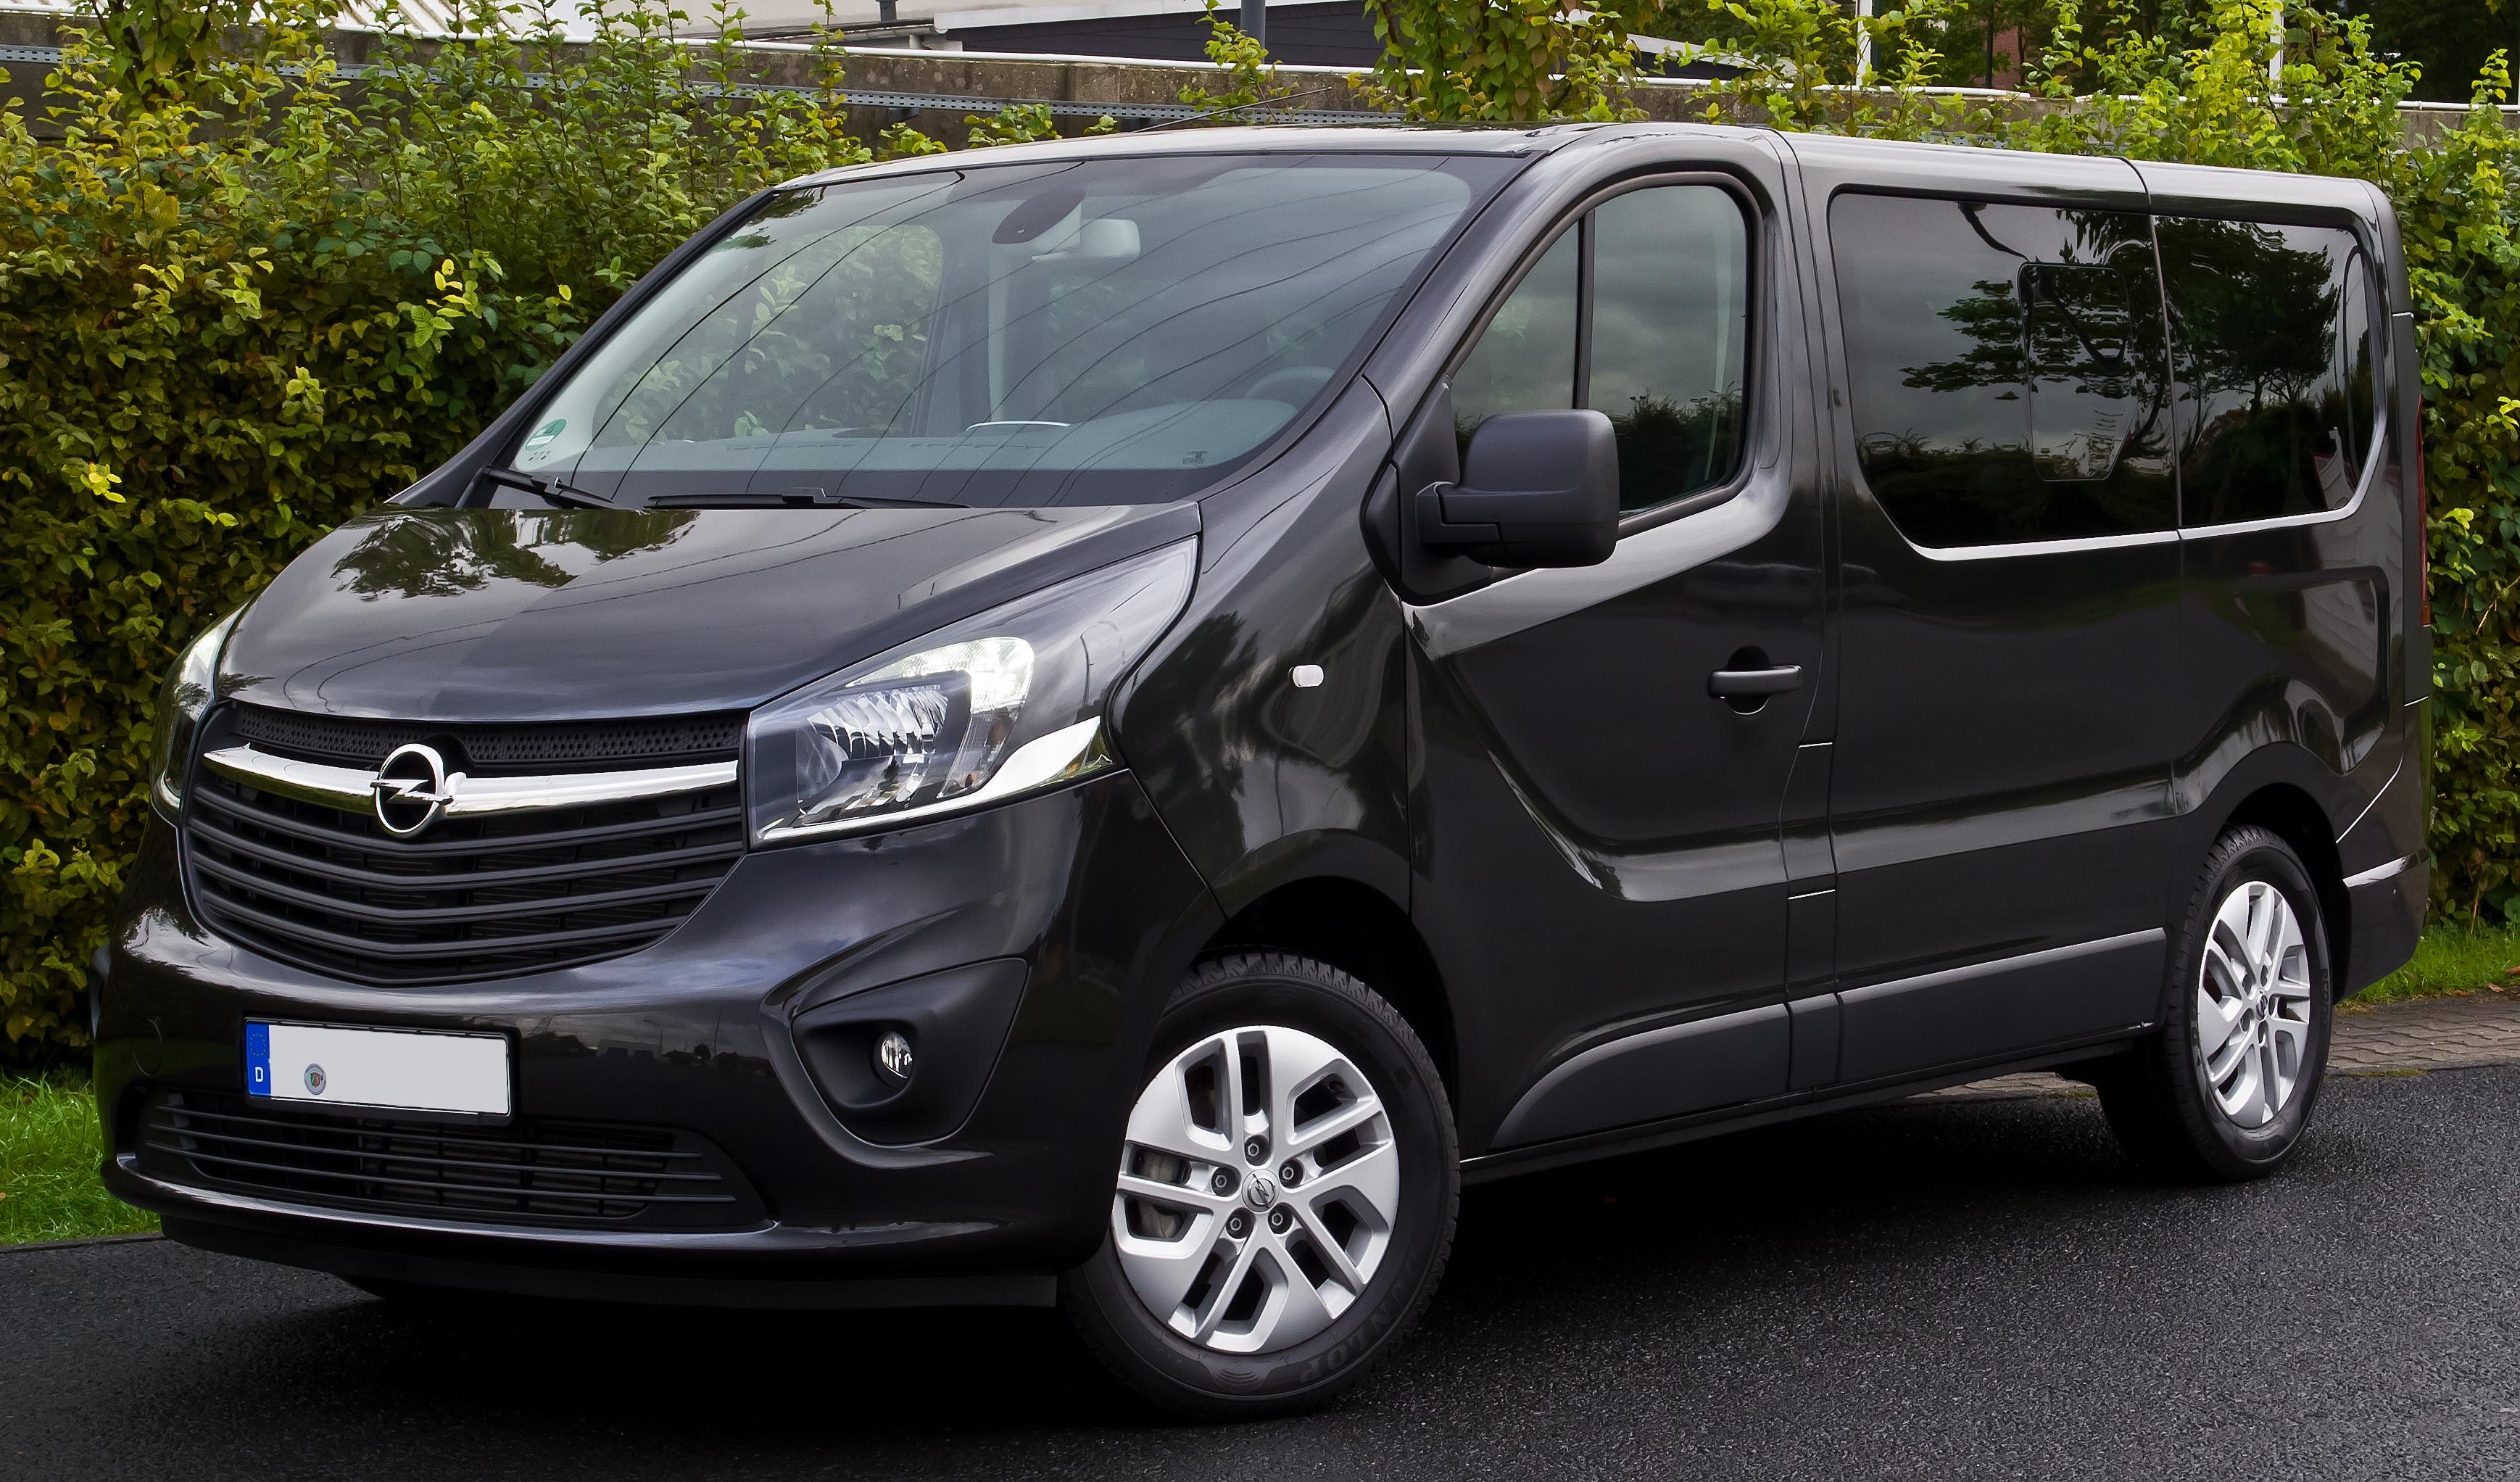 Golf 4 Dimensions >> Opel Vivaro - Wikiwand